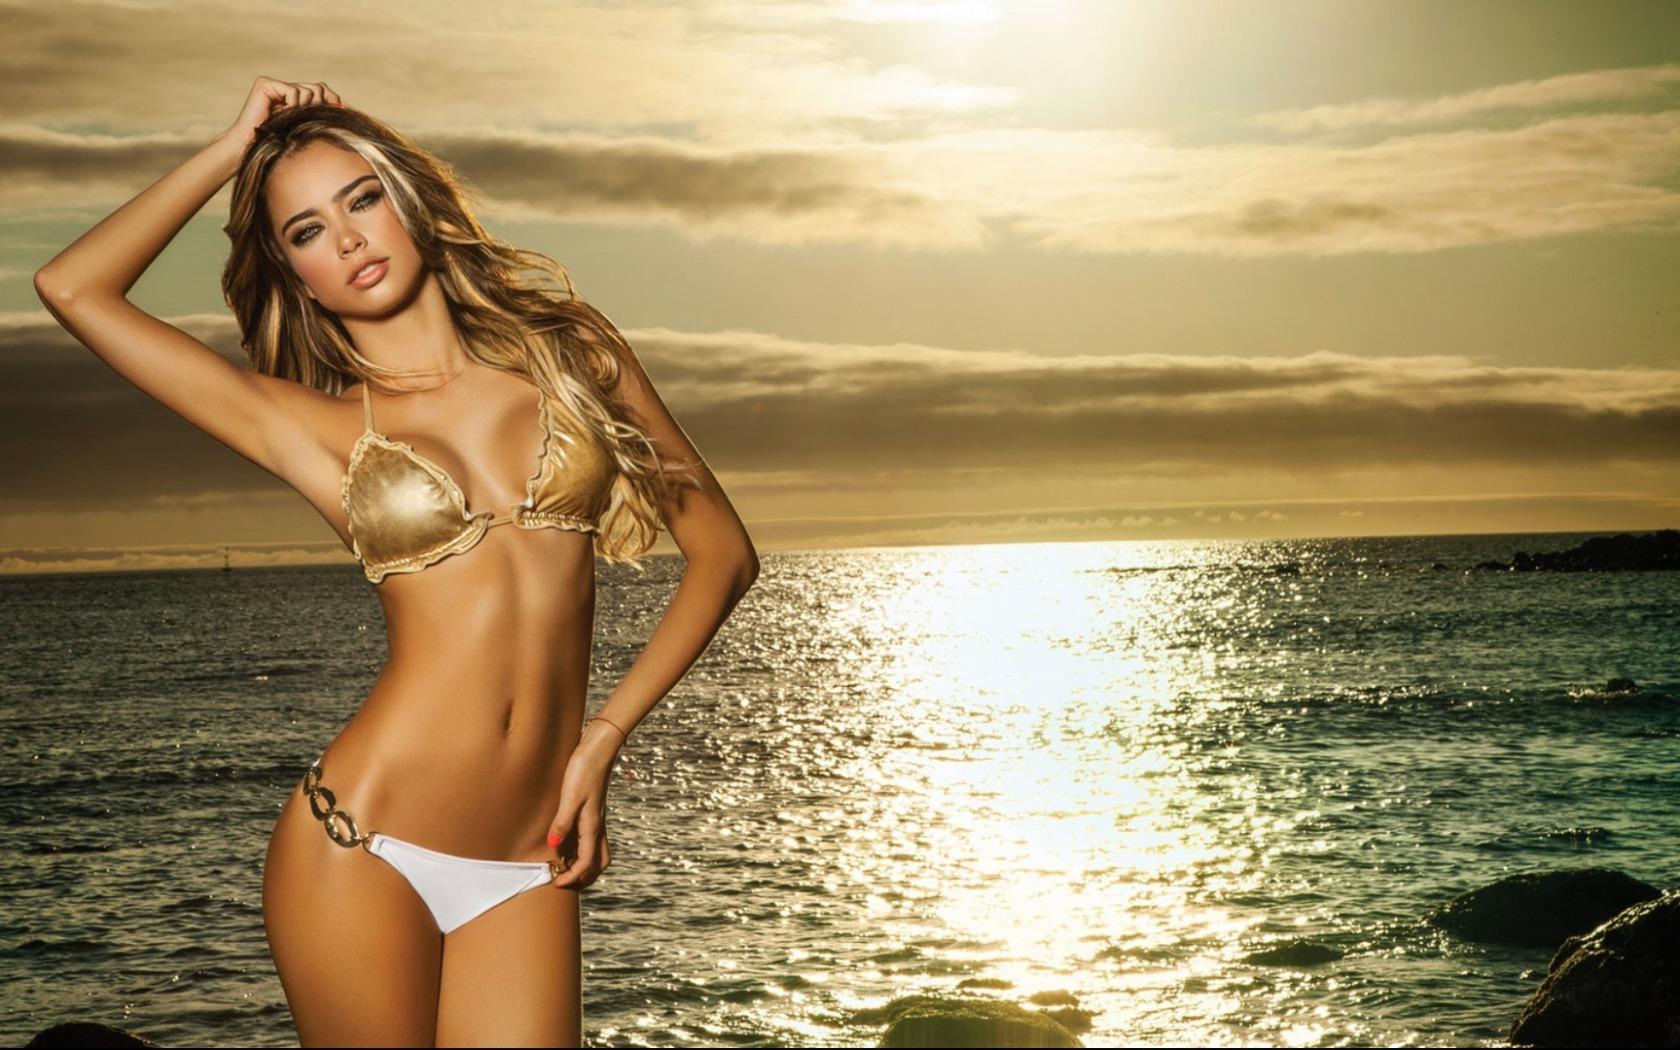 Bikini Girls Wallpaper 20129 BikinisWallpapercom 1680x1050